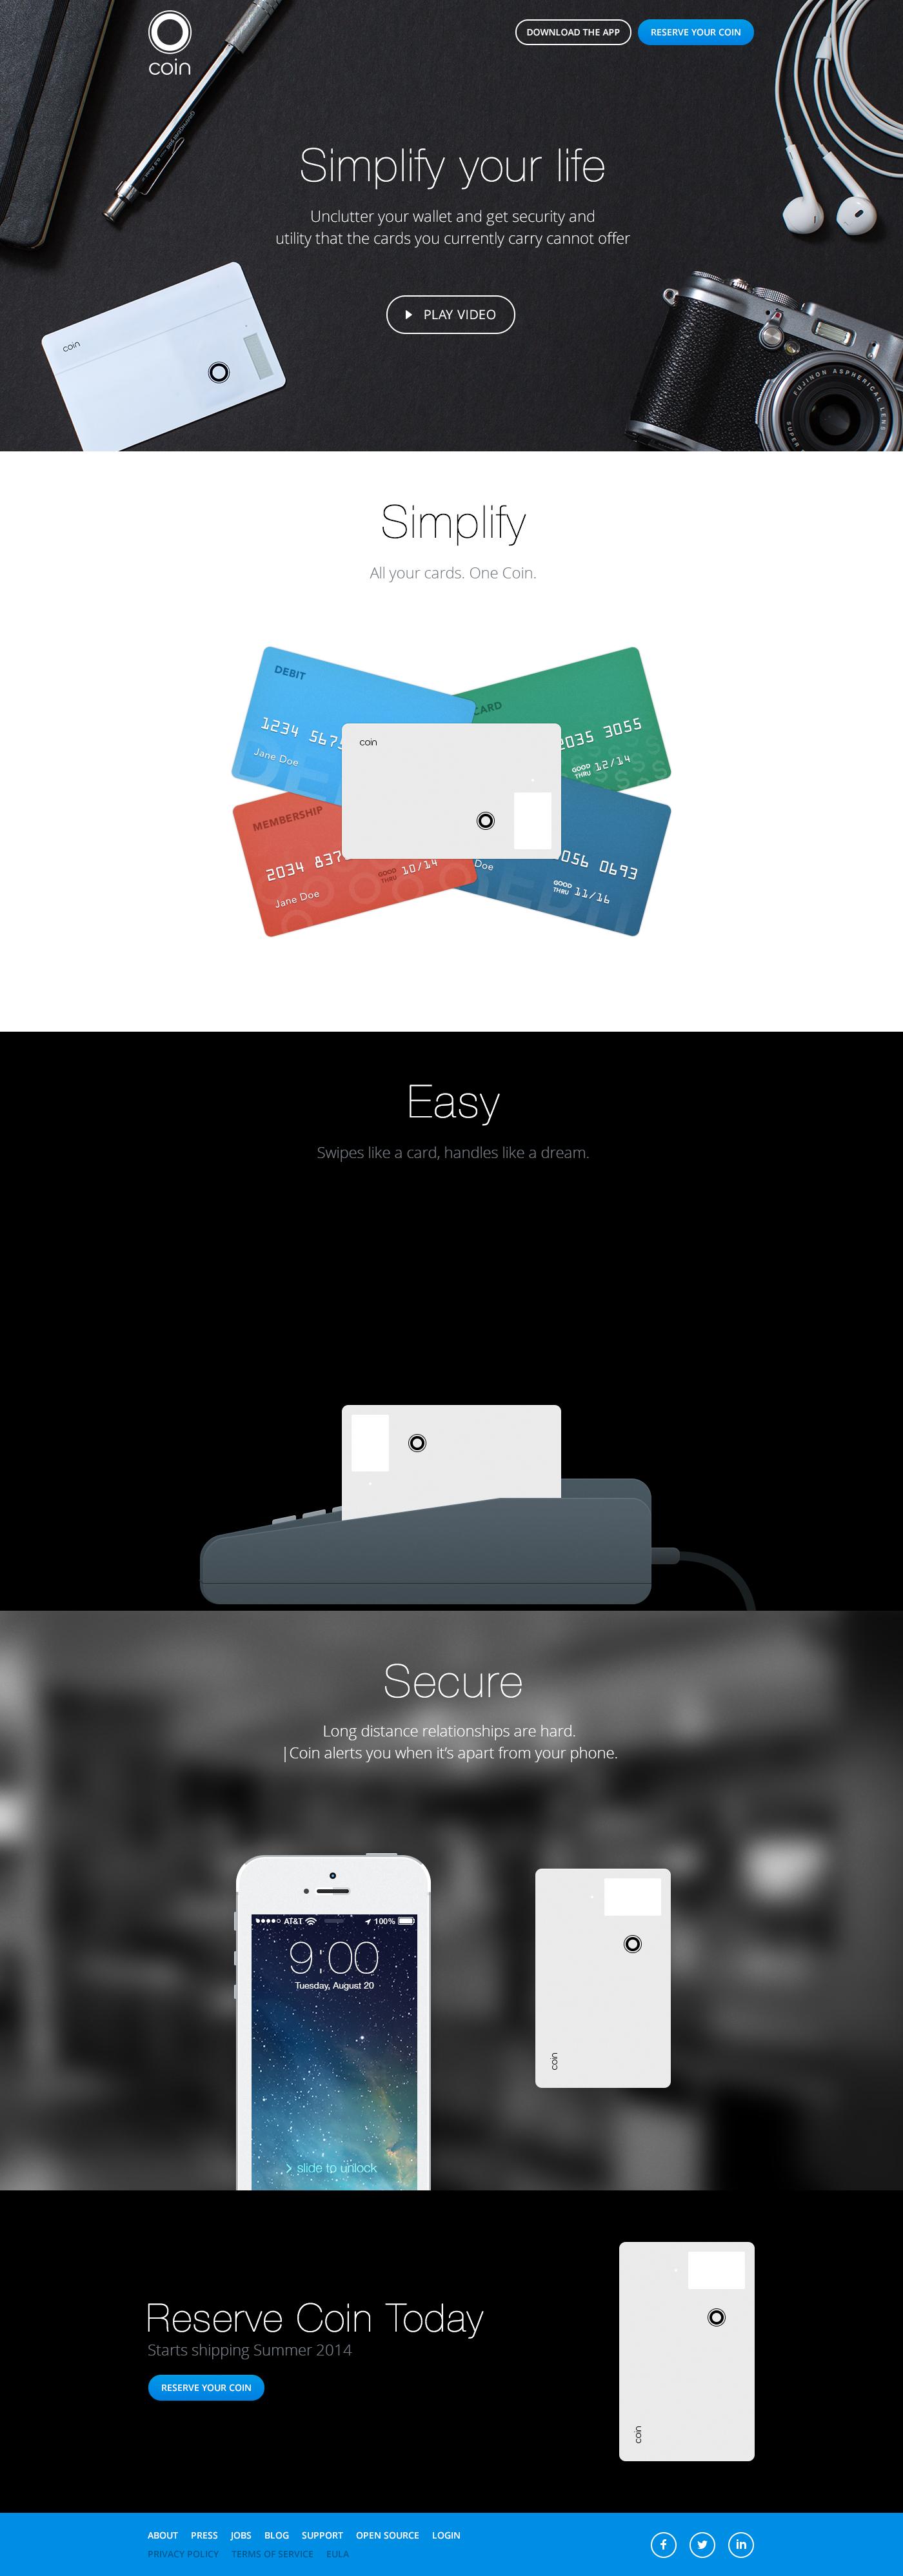 Fullpage-ActualPixels.png by Zach Roszczewski